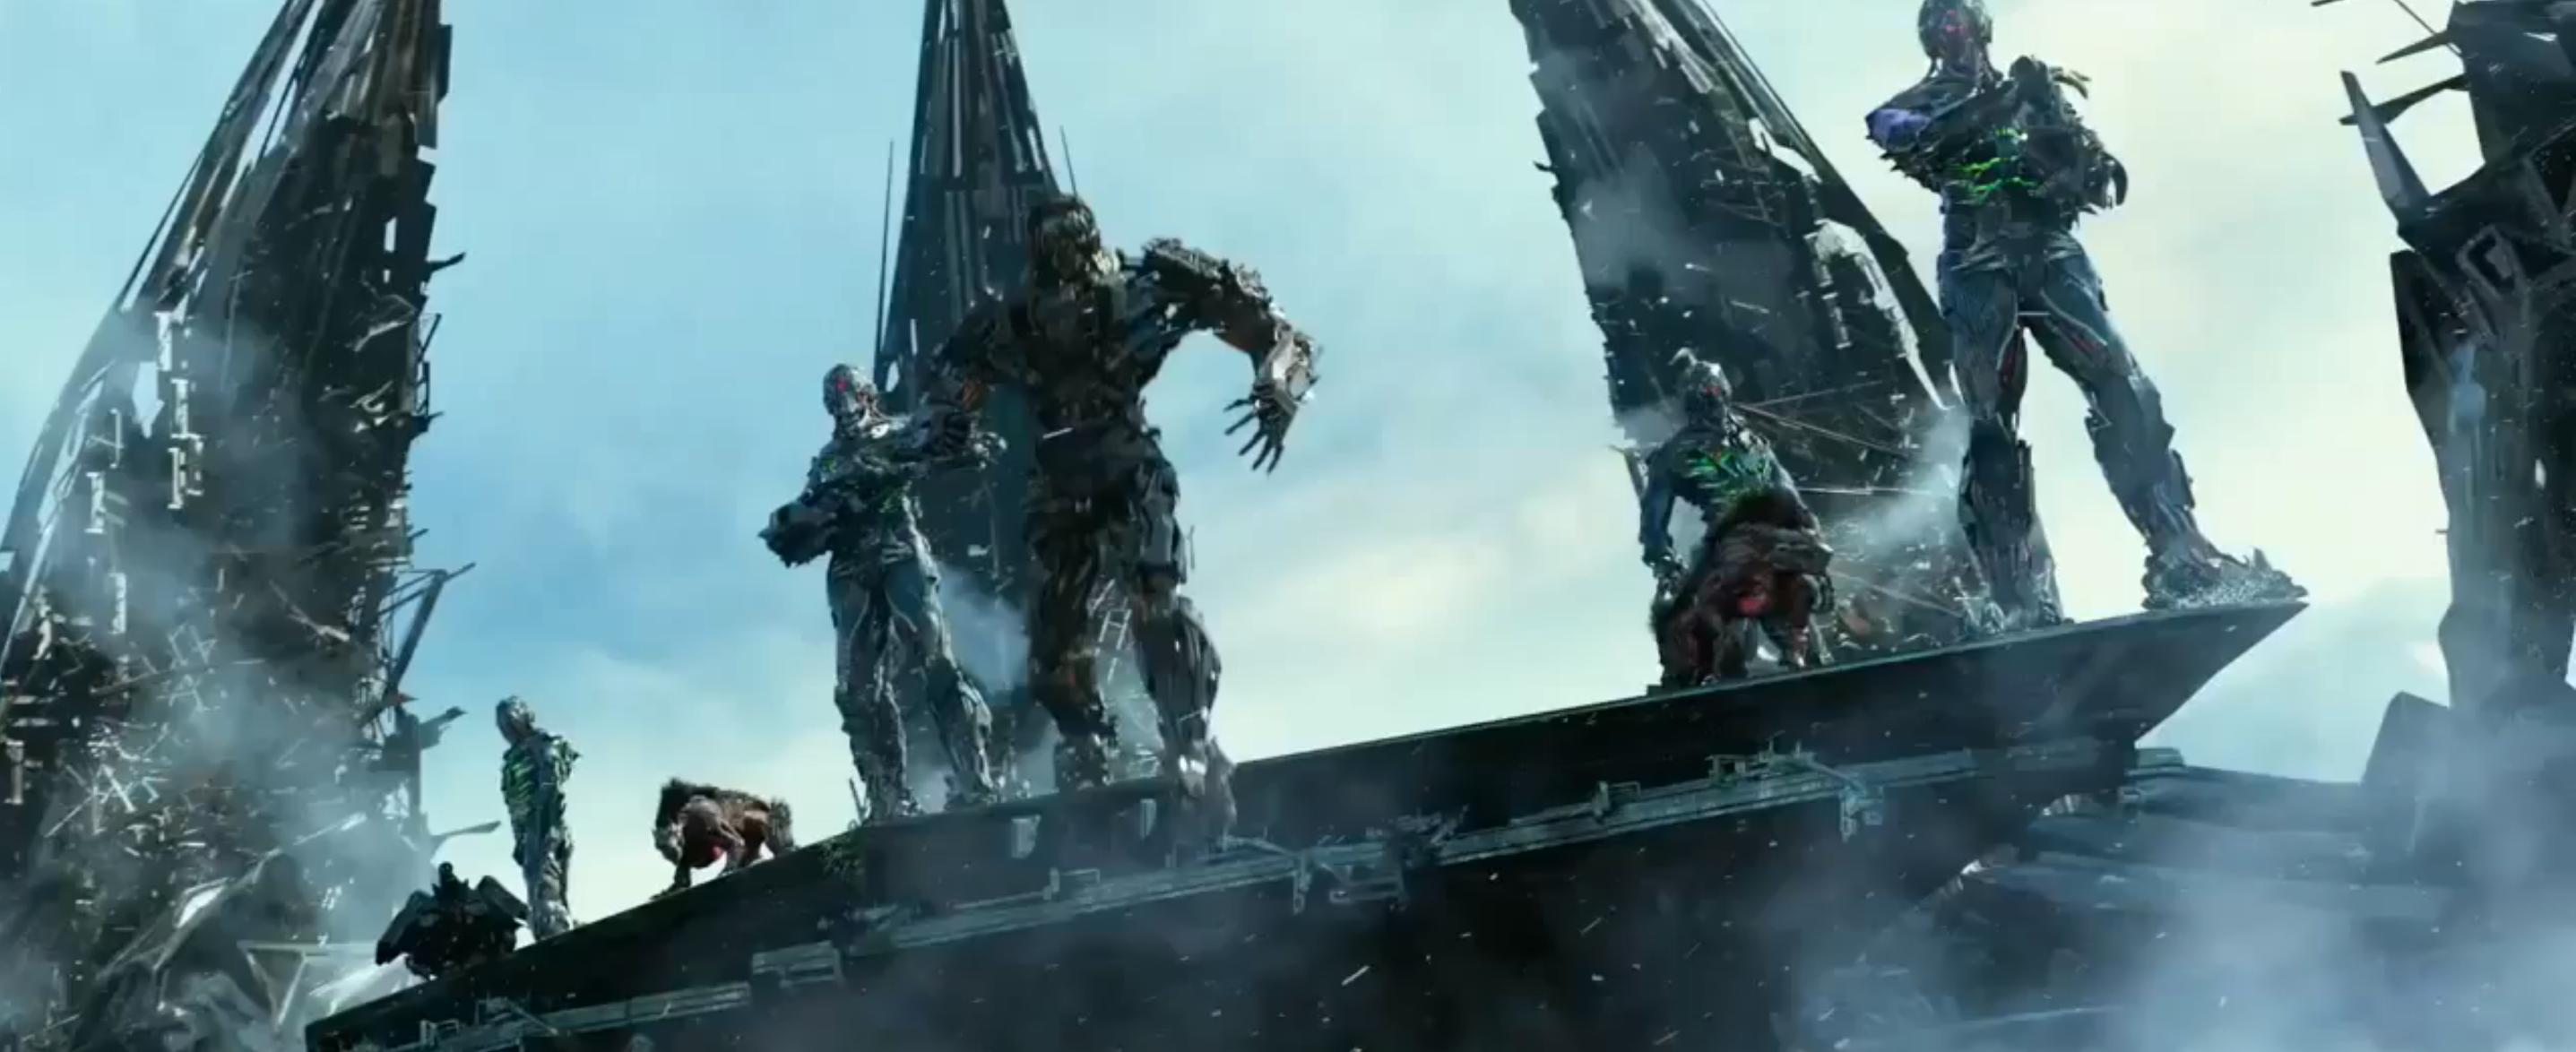 transformers 4: age of extinction – unicron, dinobots, quintessons